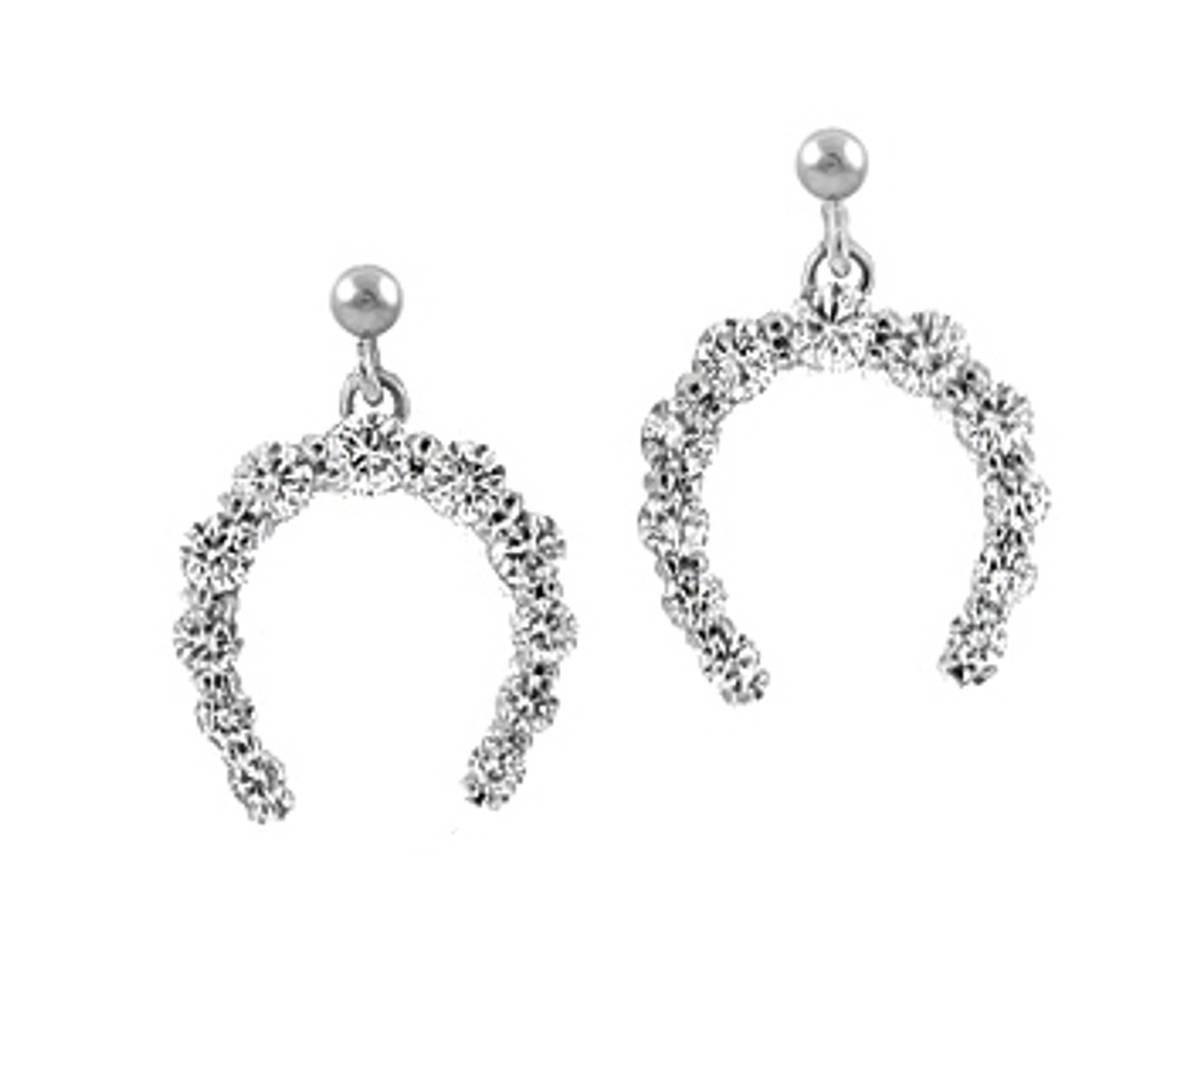 18k white gold brilliant cut diamond horseshoe stud earringsDETAILSCarat: total diamond weight 1.22cts Made in Ireland